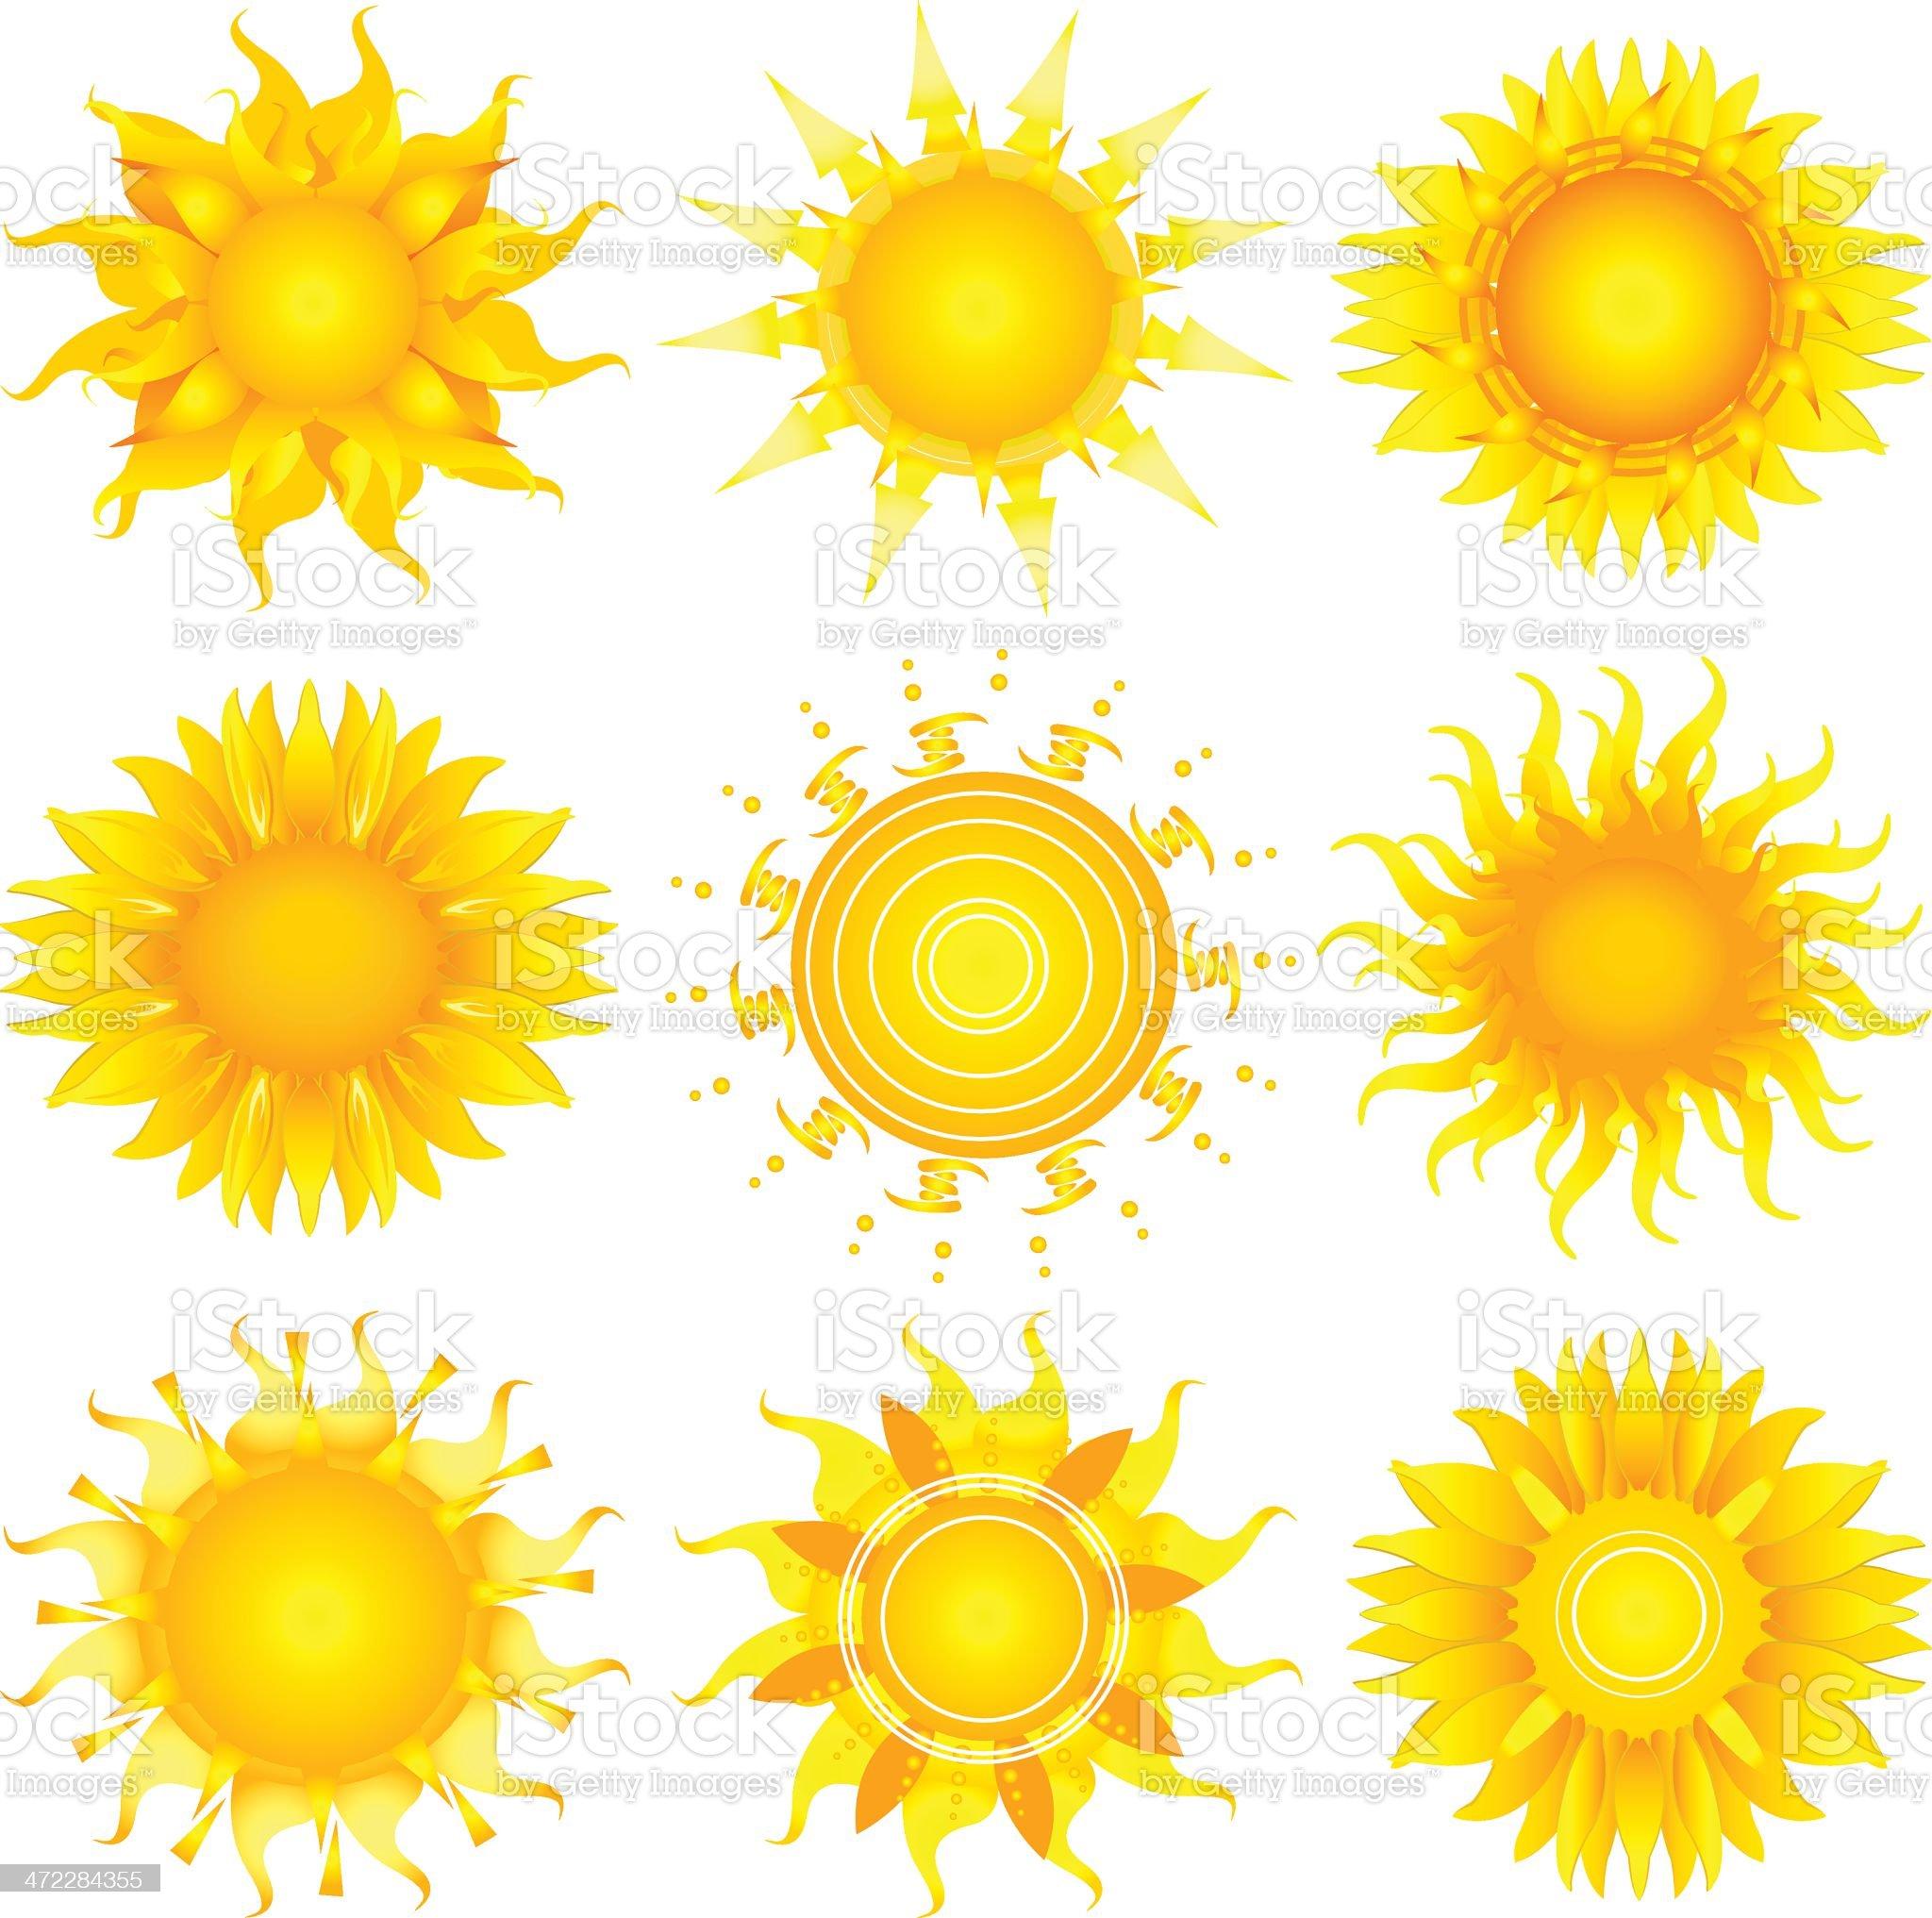 sun royalty-free stock vector art